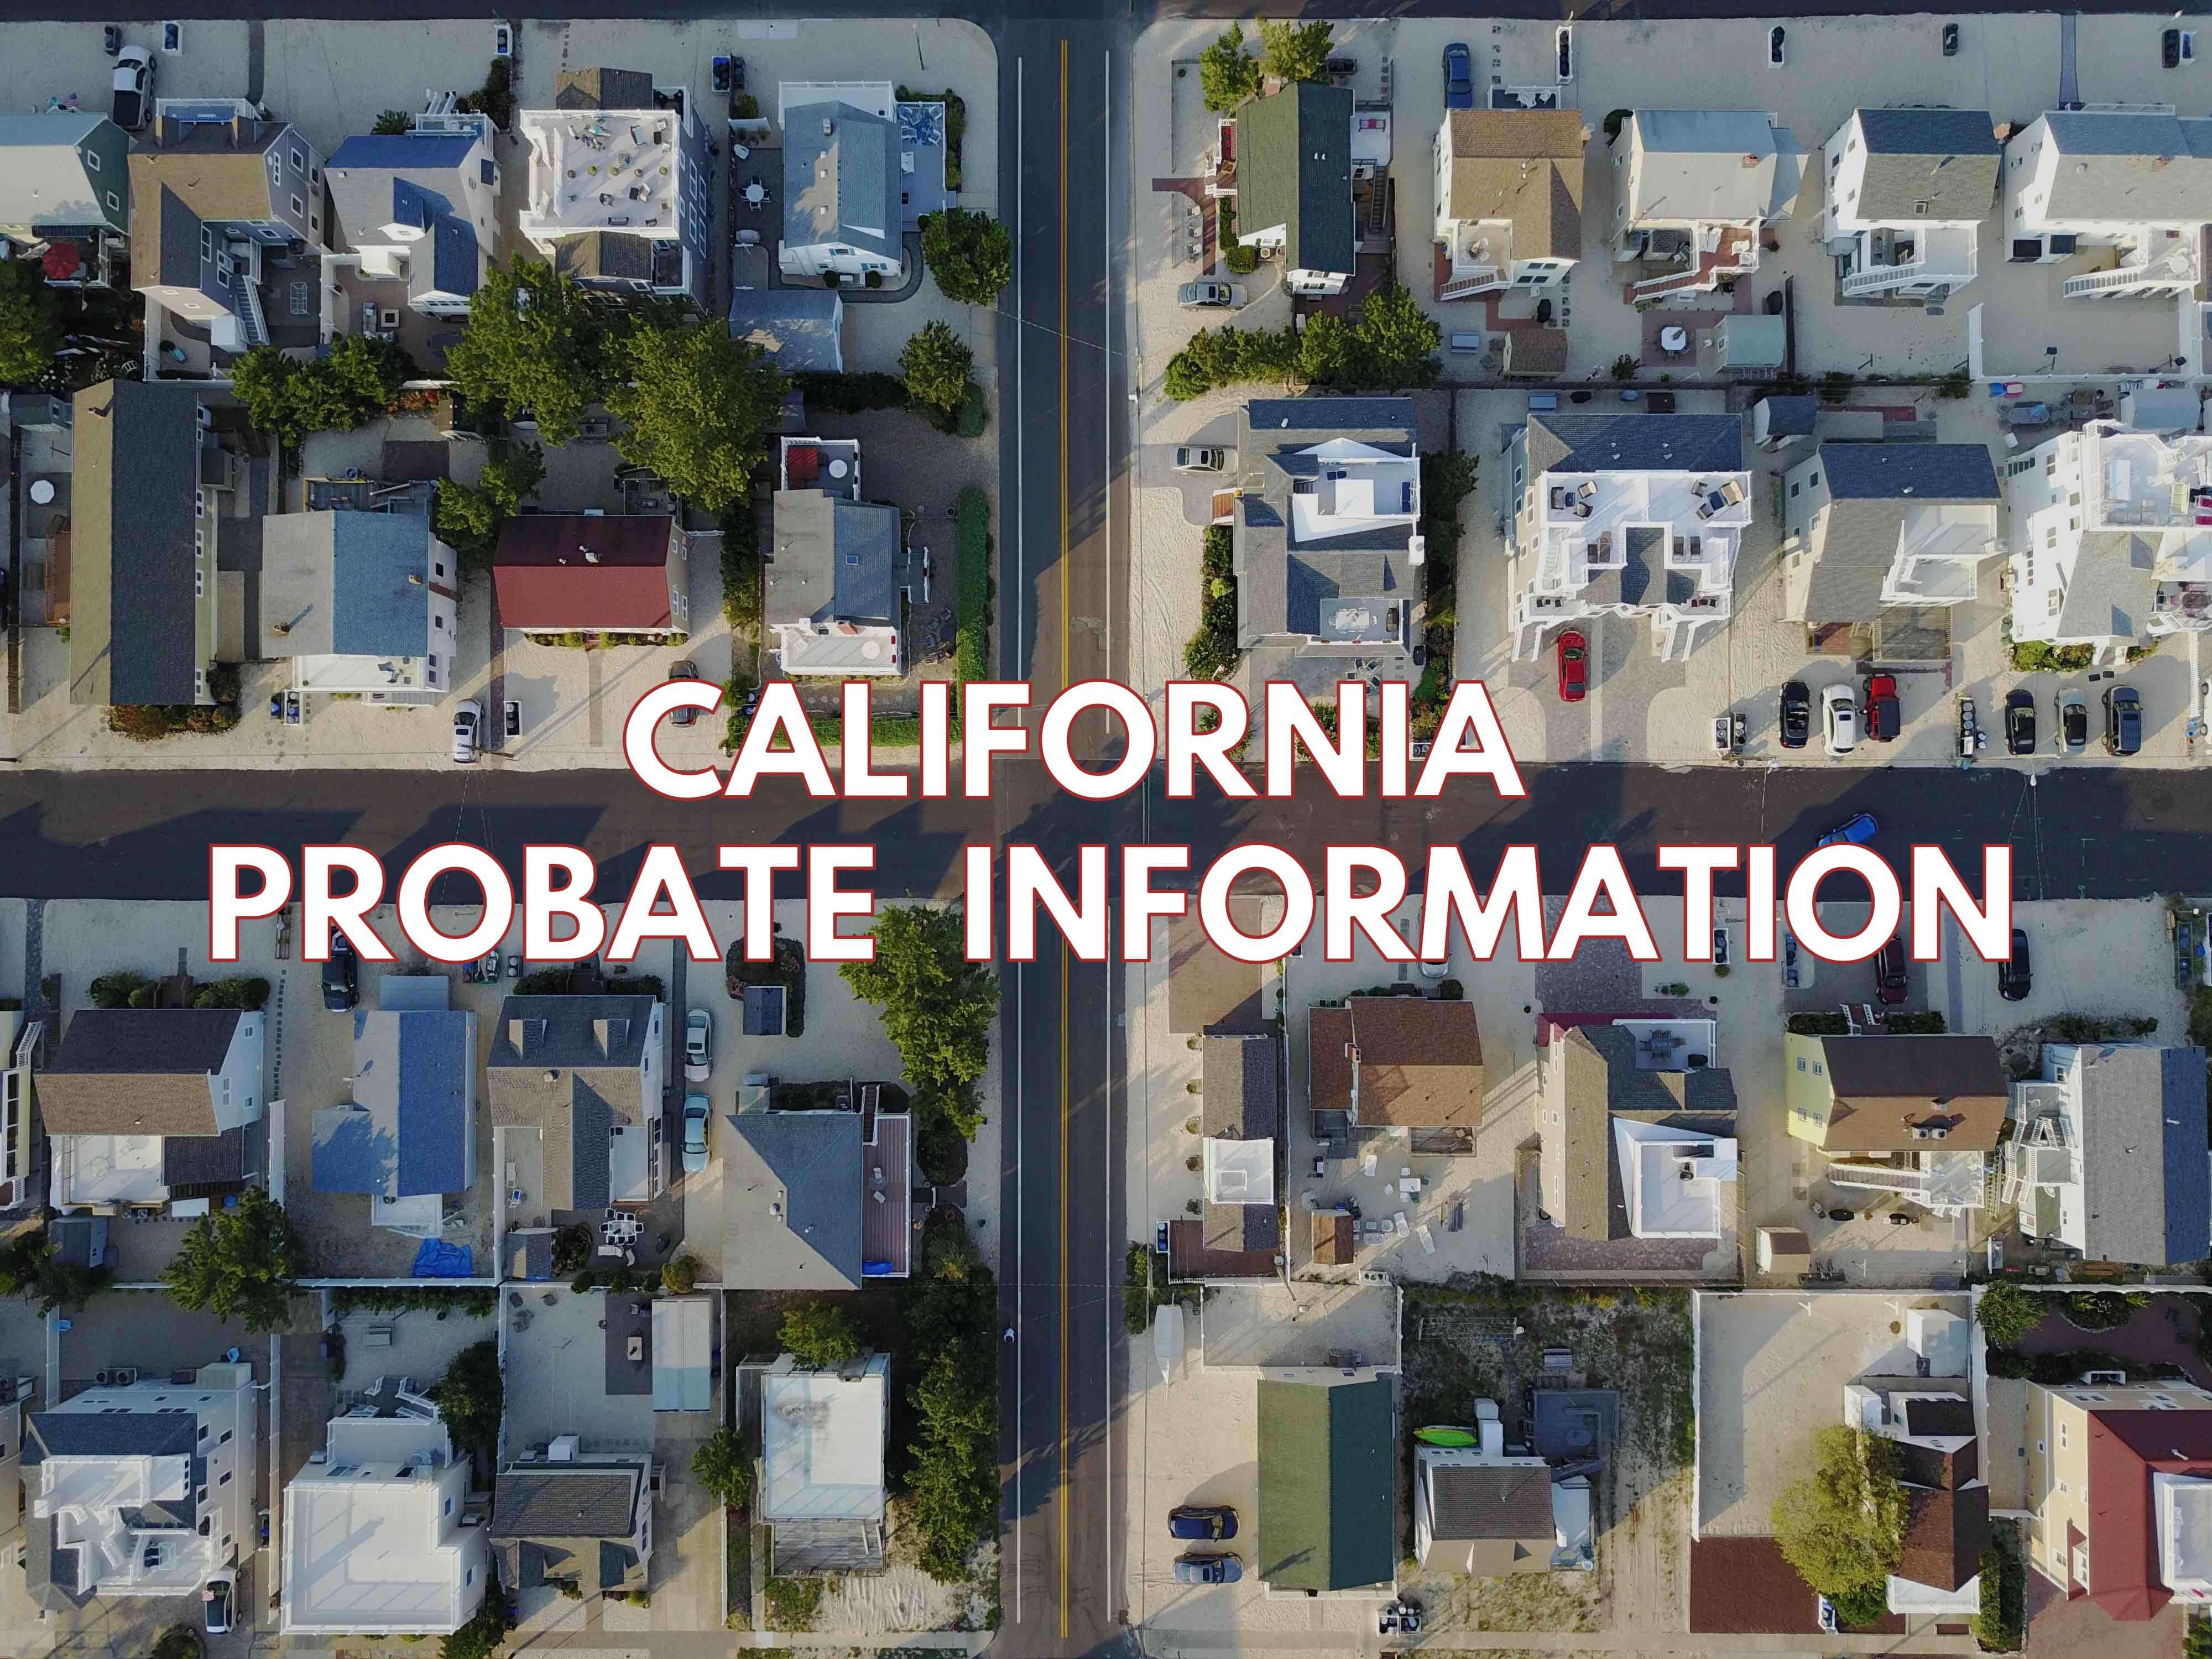 California Probate Information https//apeopleschoice